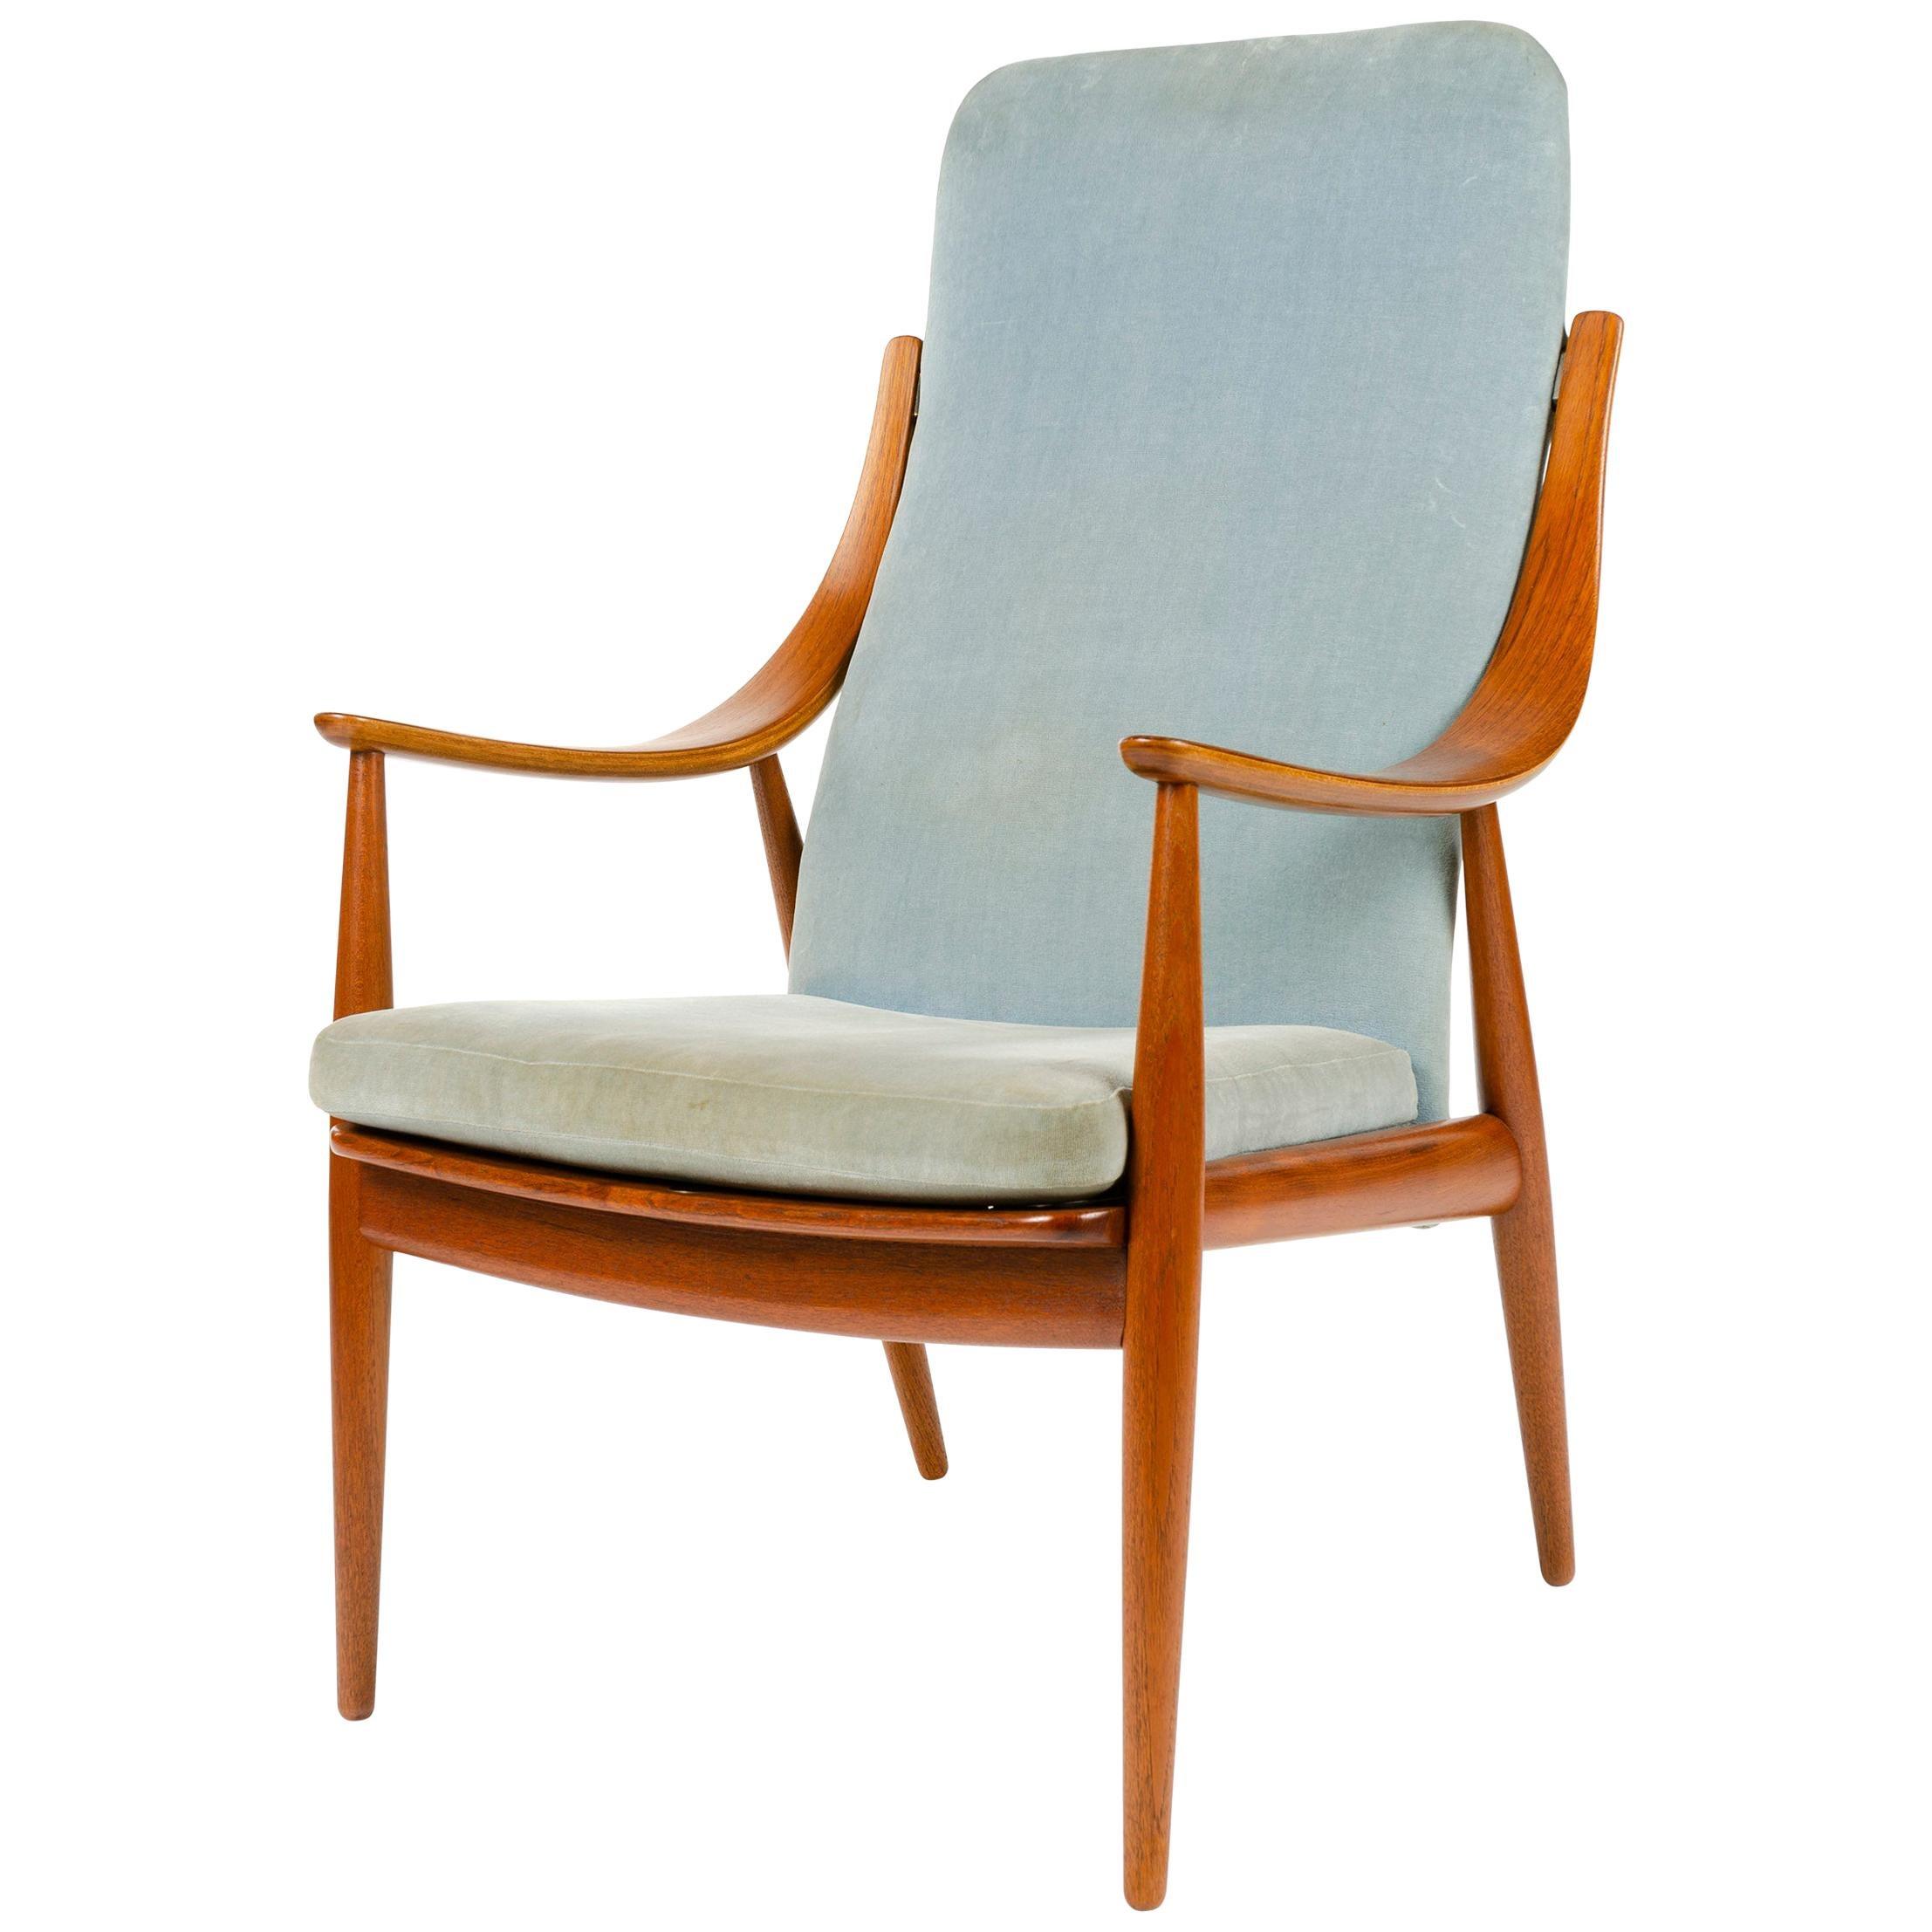 1950s Danish Upholstered High Back Armchair by Hvidt & Mölgaard-Nielsen